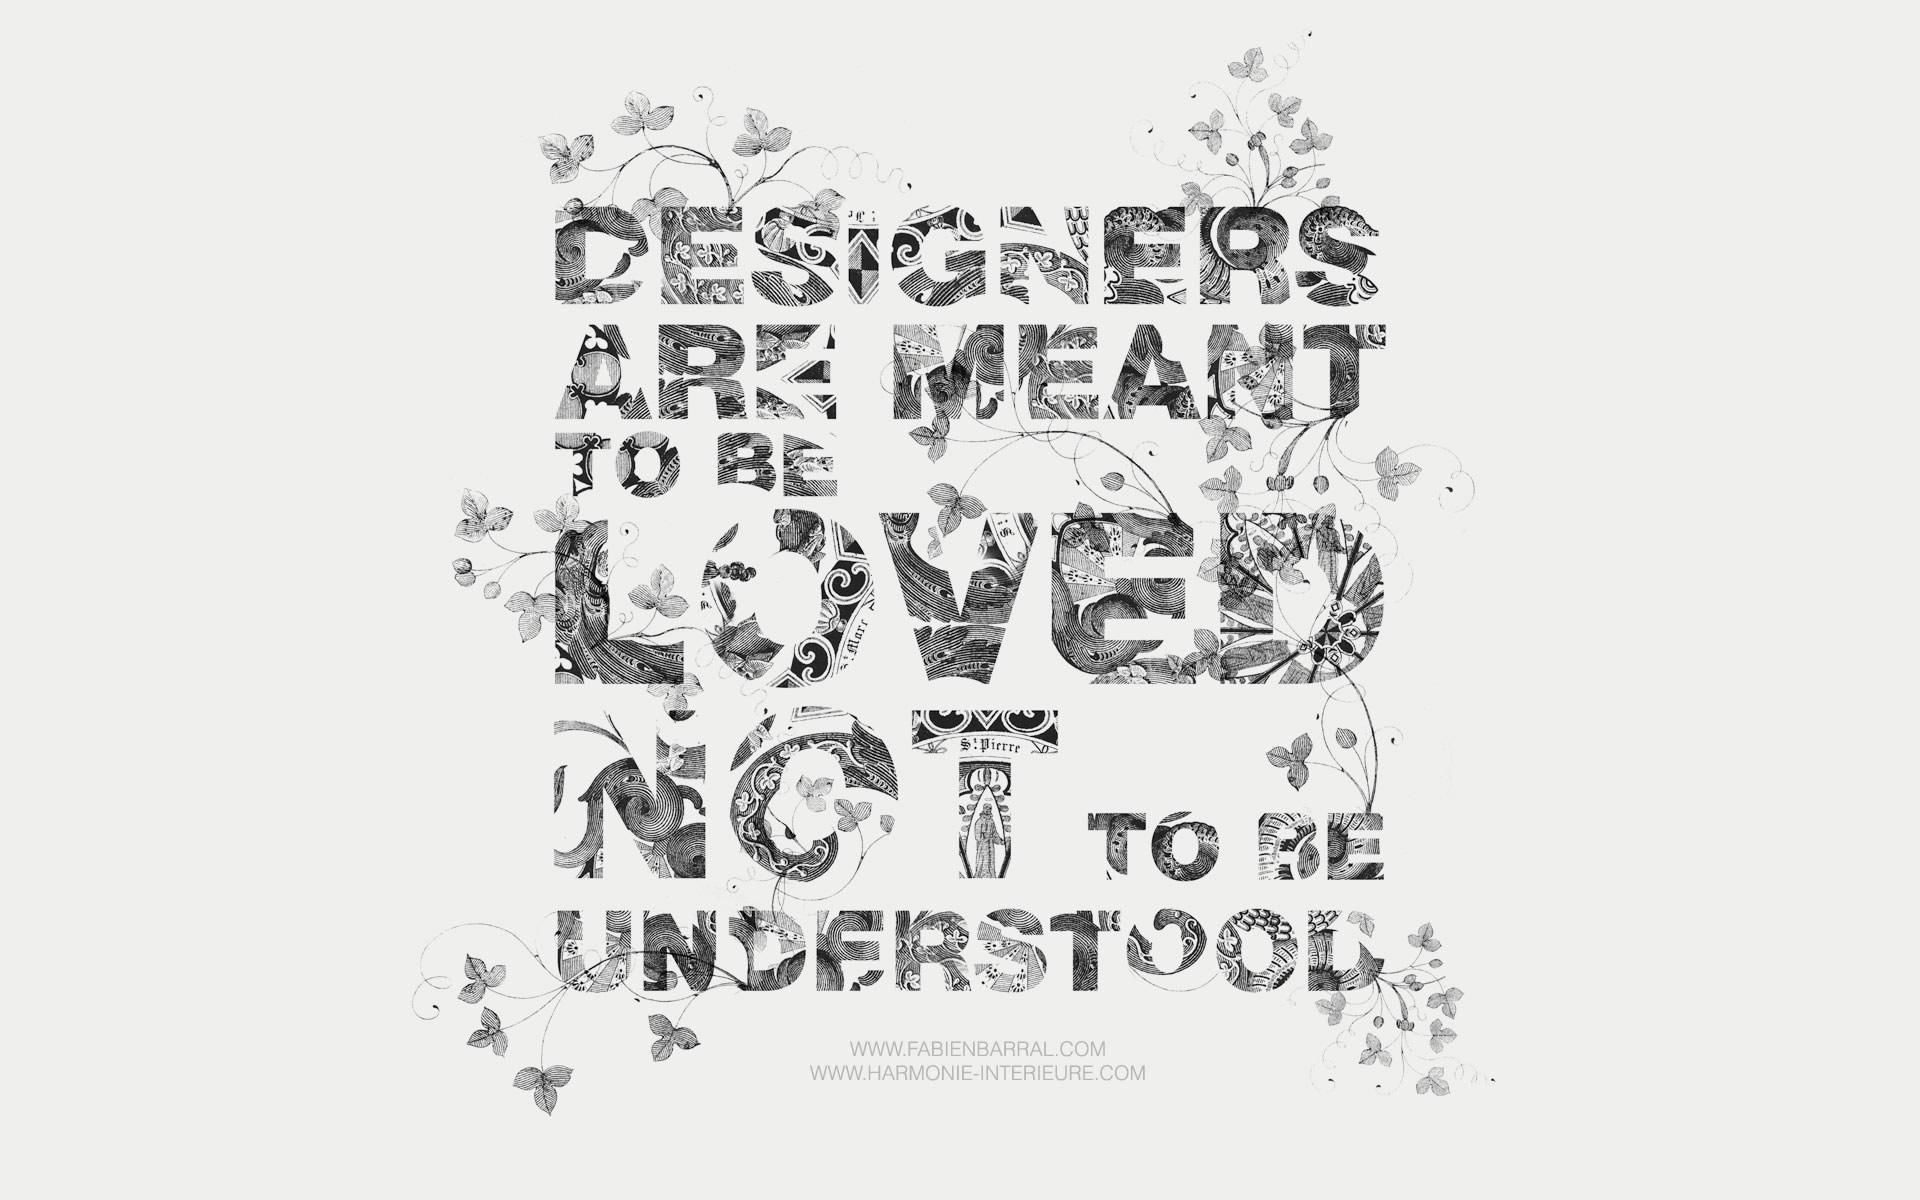 Best Cool Typography Design Hd Wallpapers Desktop Backgrounds 2a